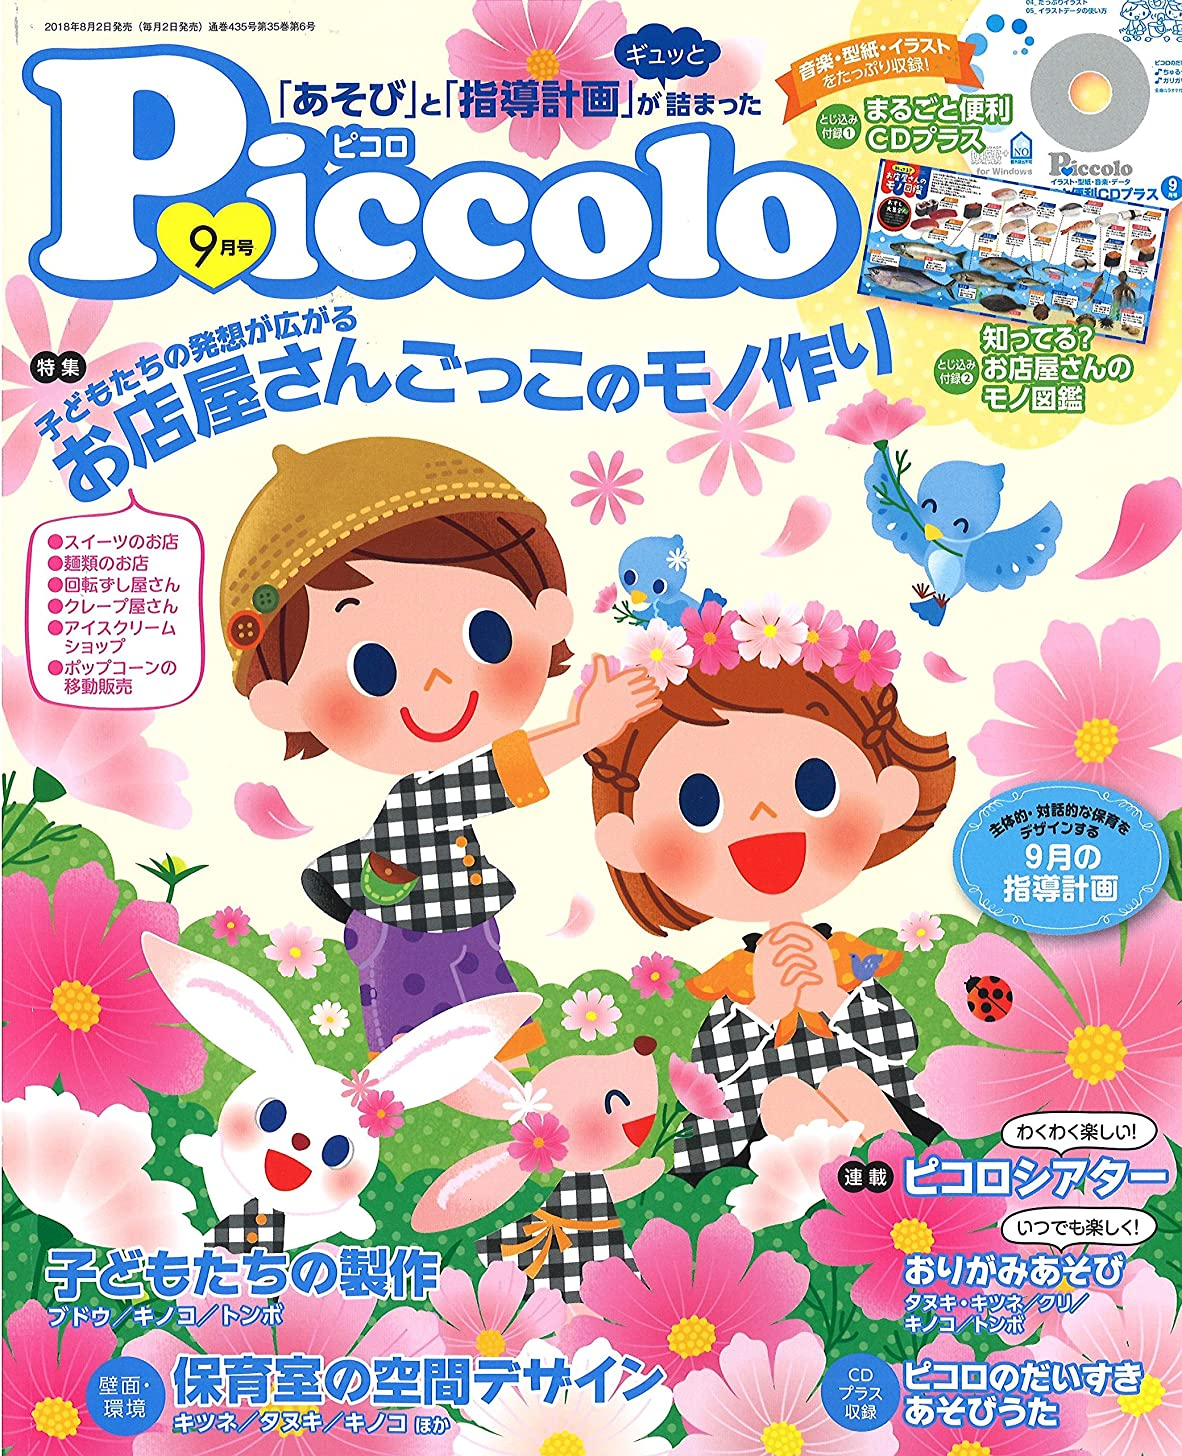 JAPANESE MAGAZINE Piccolo (Piccolo) 2018 September issue [magazine]